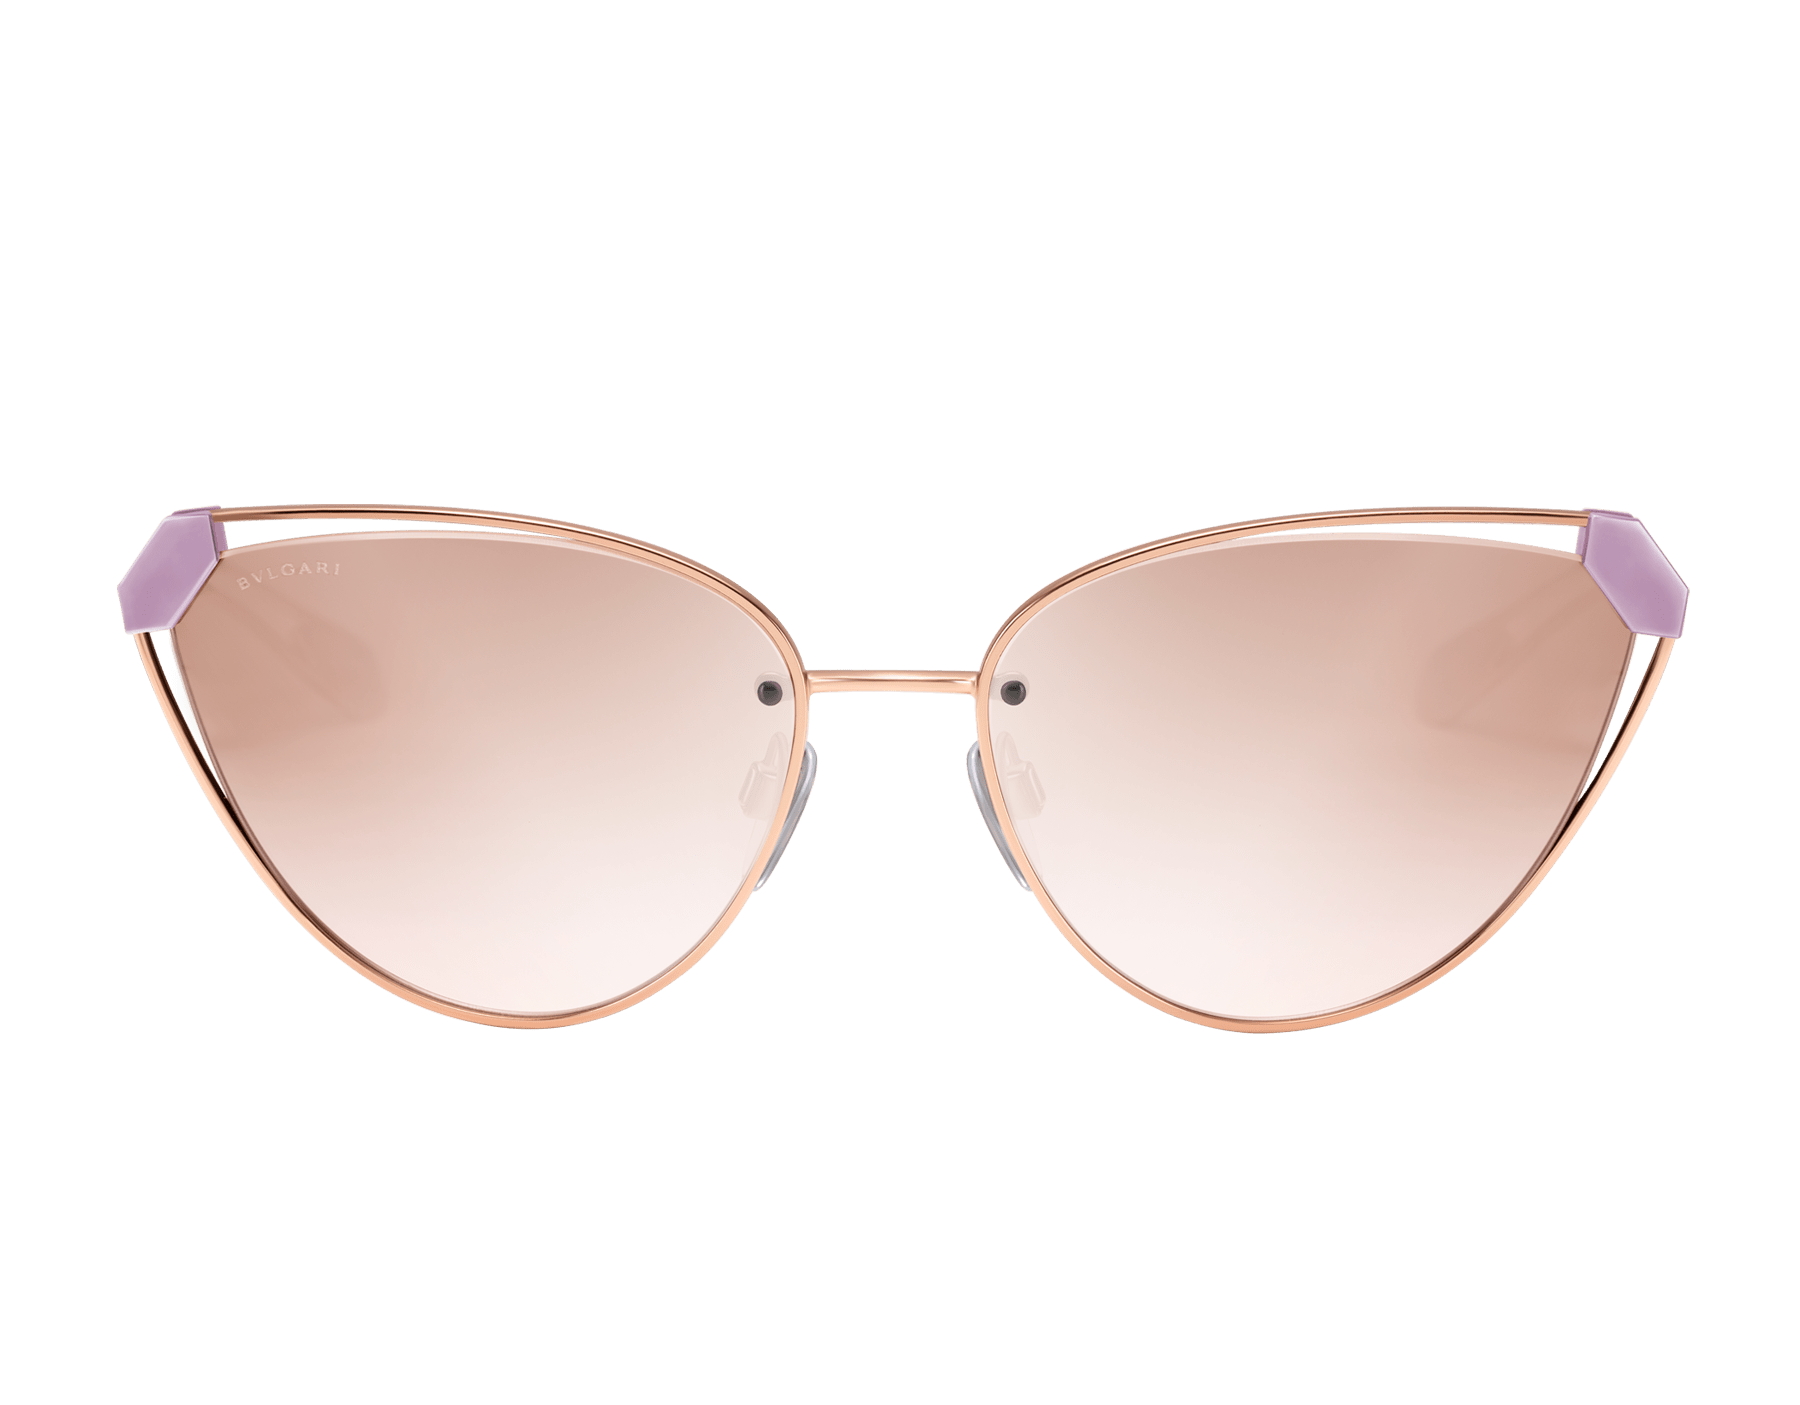 Bvlgari Serpenti Candy Scale narrow cat-eye metal sunglasses. 903727 image 2